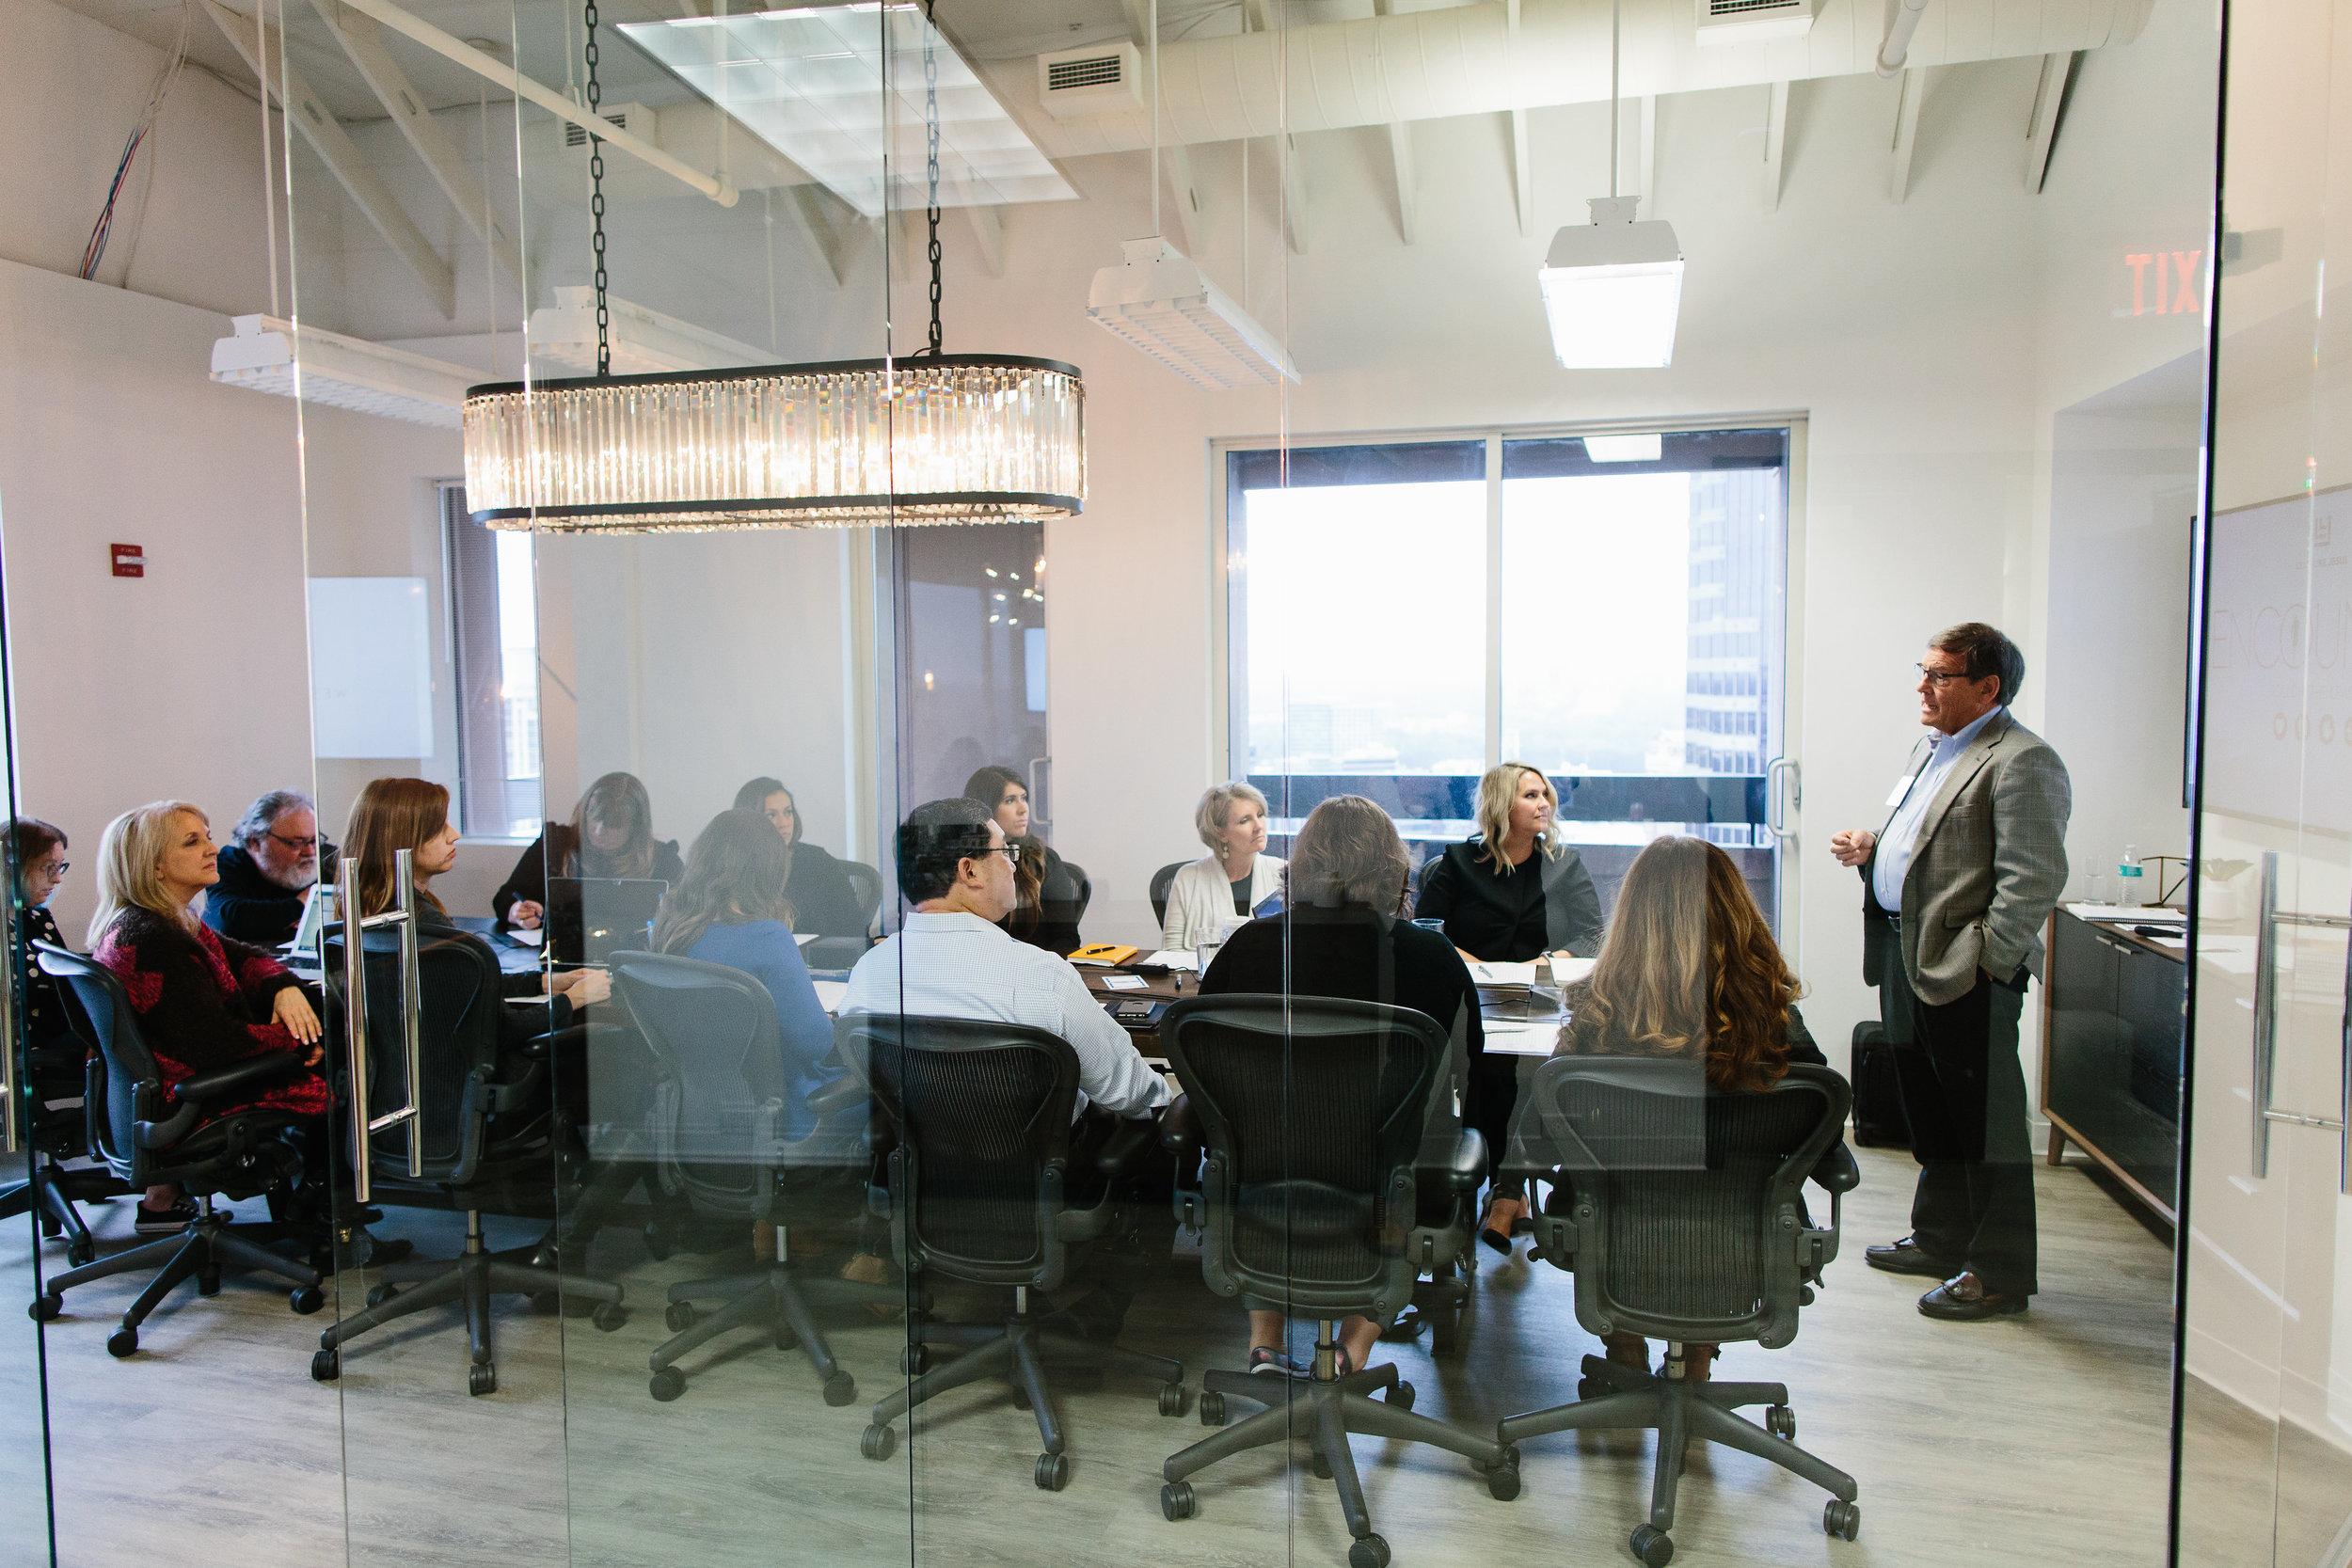 conference room design interior.jpg